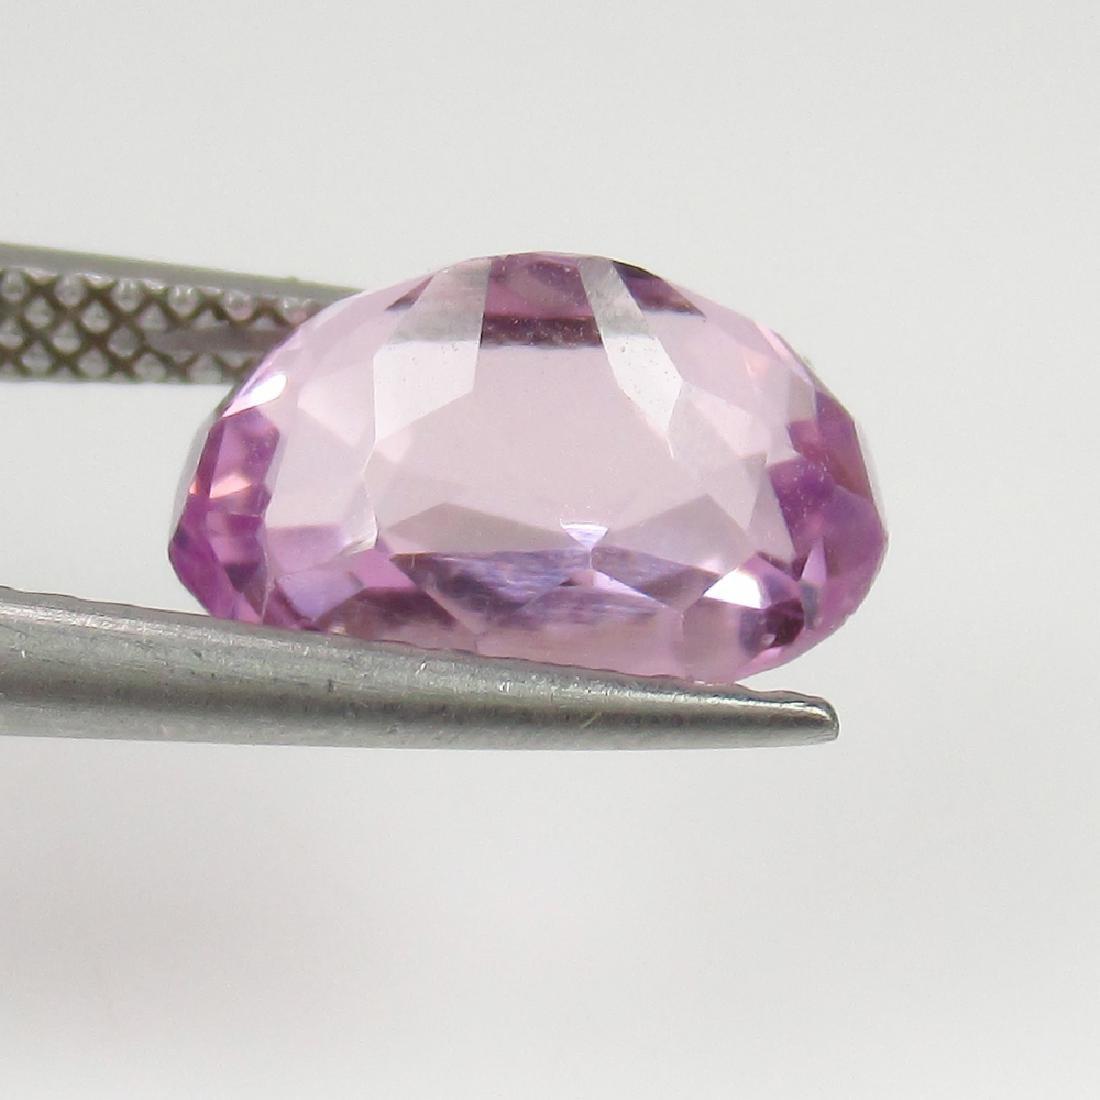 3.55 Ct IGI Certified Genuine Brazil Pink Spodumene - 3